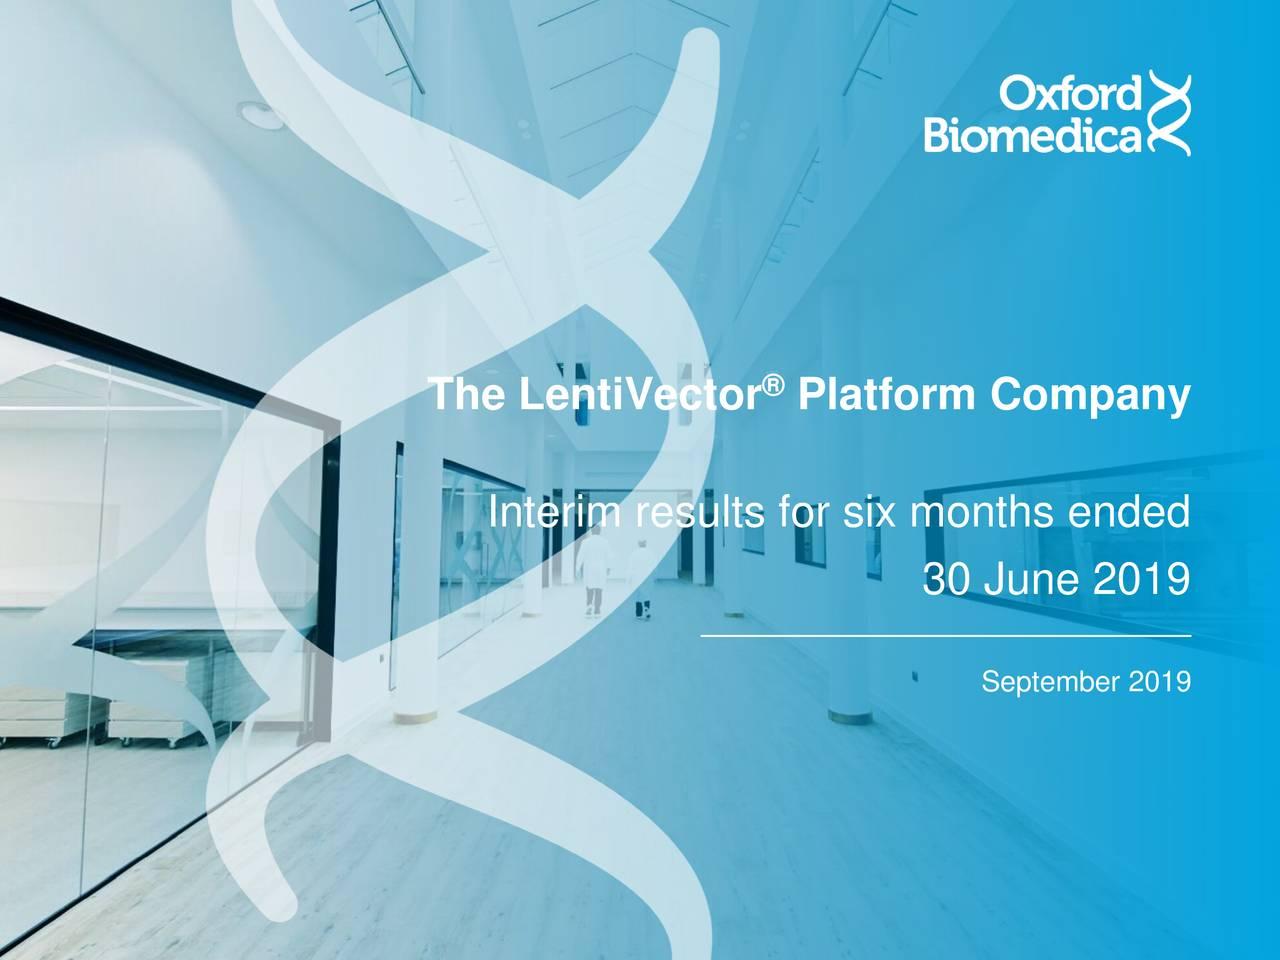 The LentiVector Platform Company